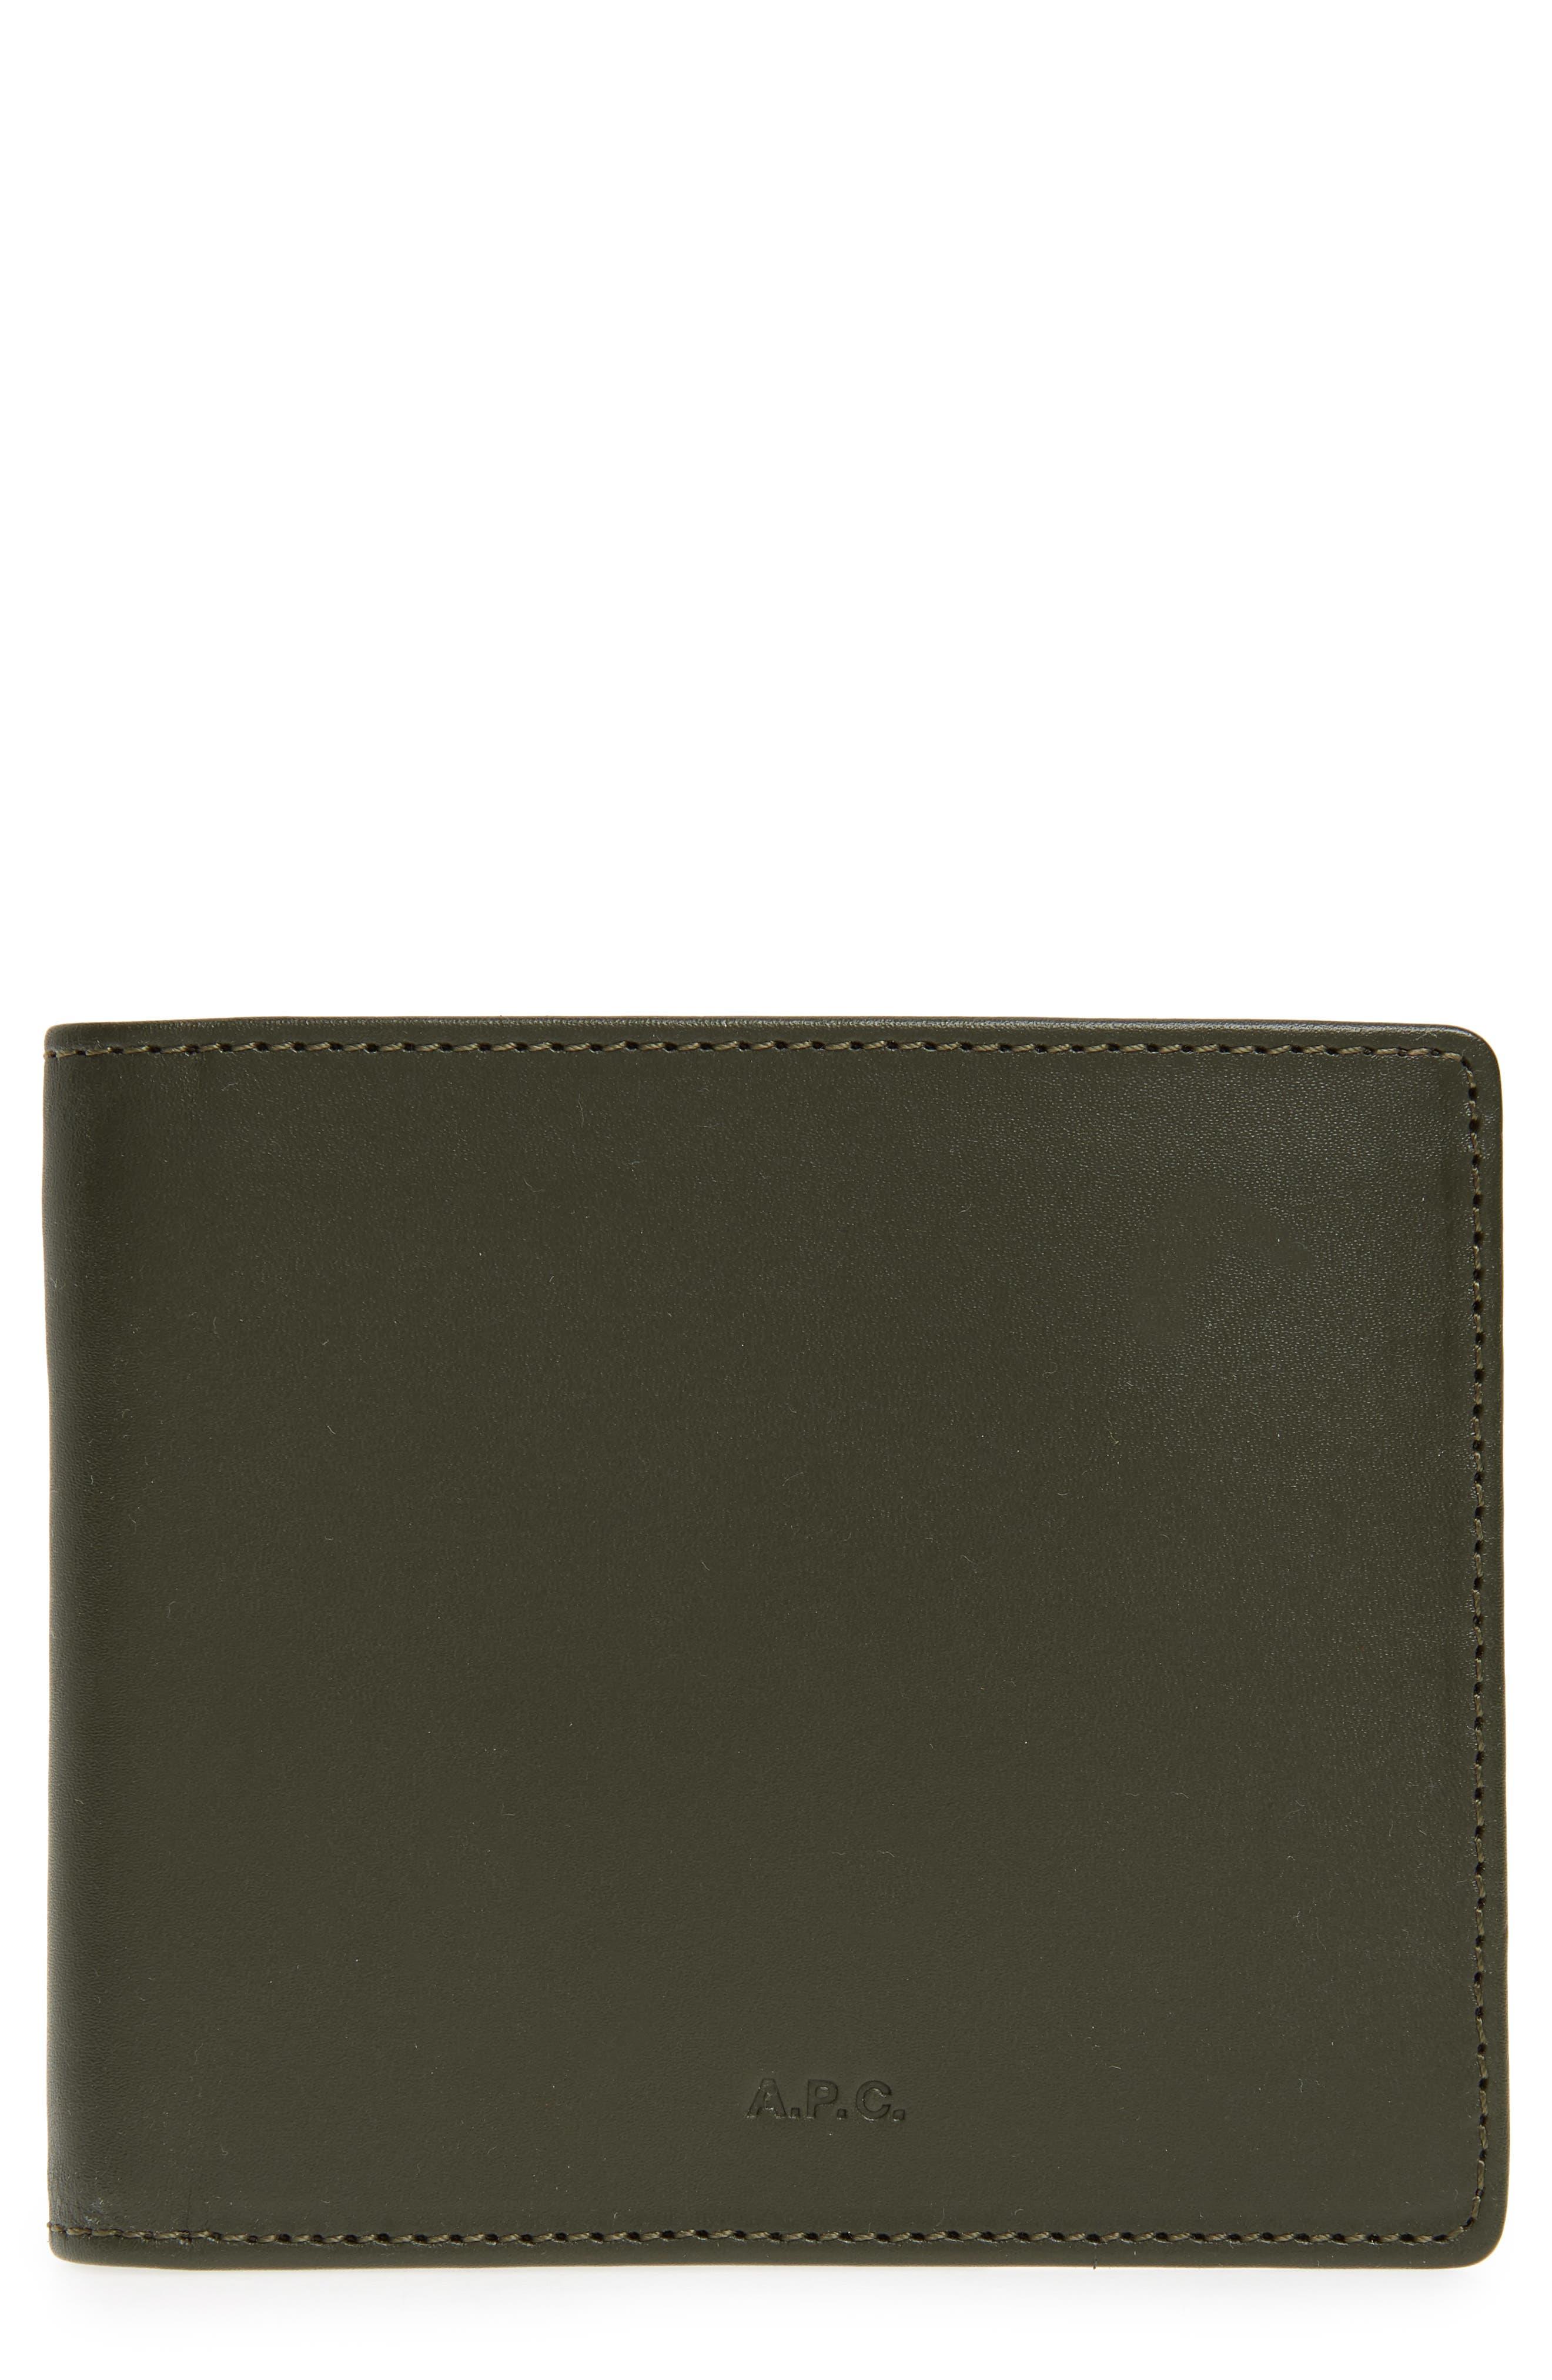 Aly Bifold Leather Wallet,                             Main thumbnail 1, color,                             KHAKI